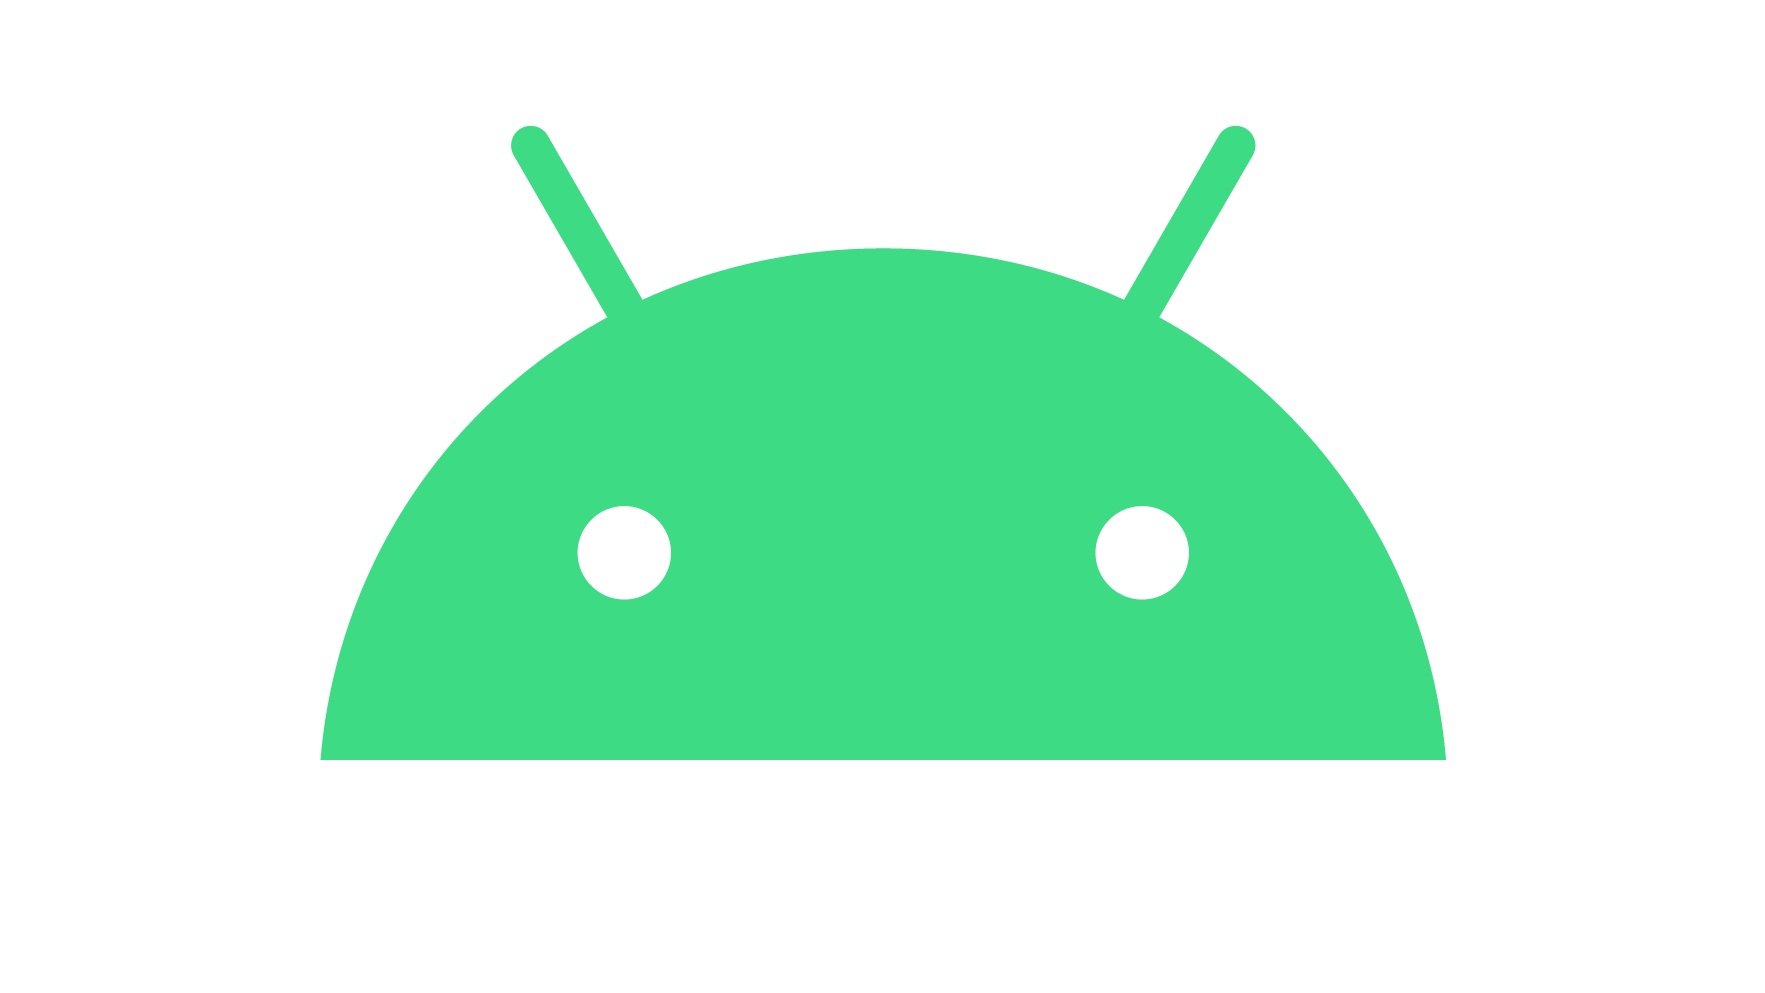 [Solved] - Disable Safe Mode on BLU G8